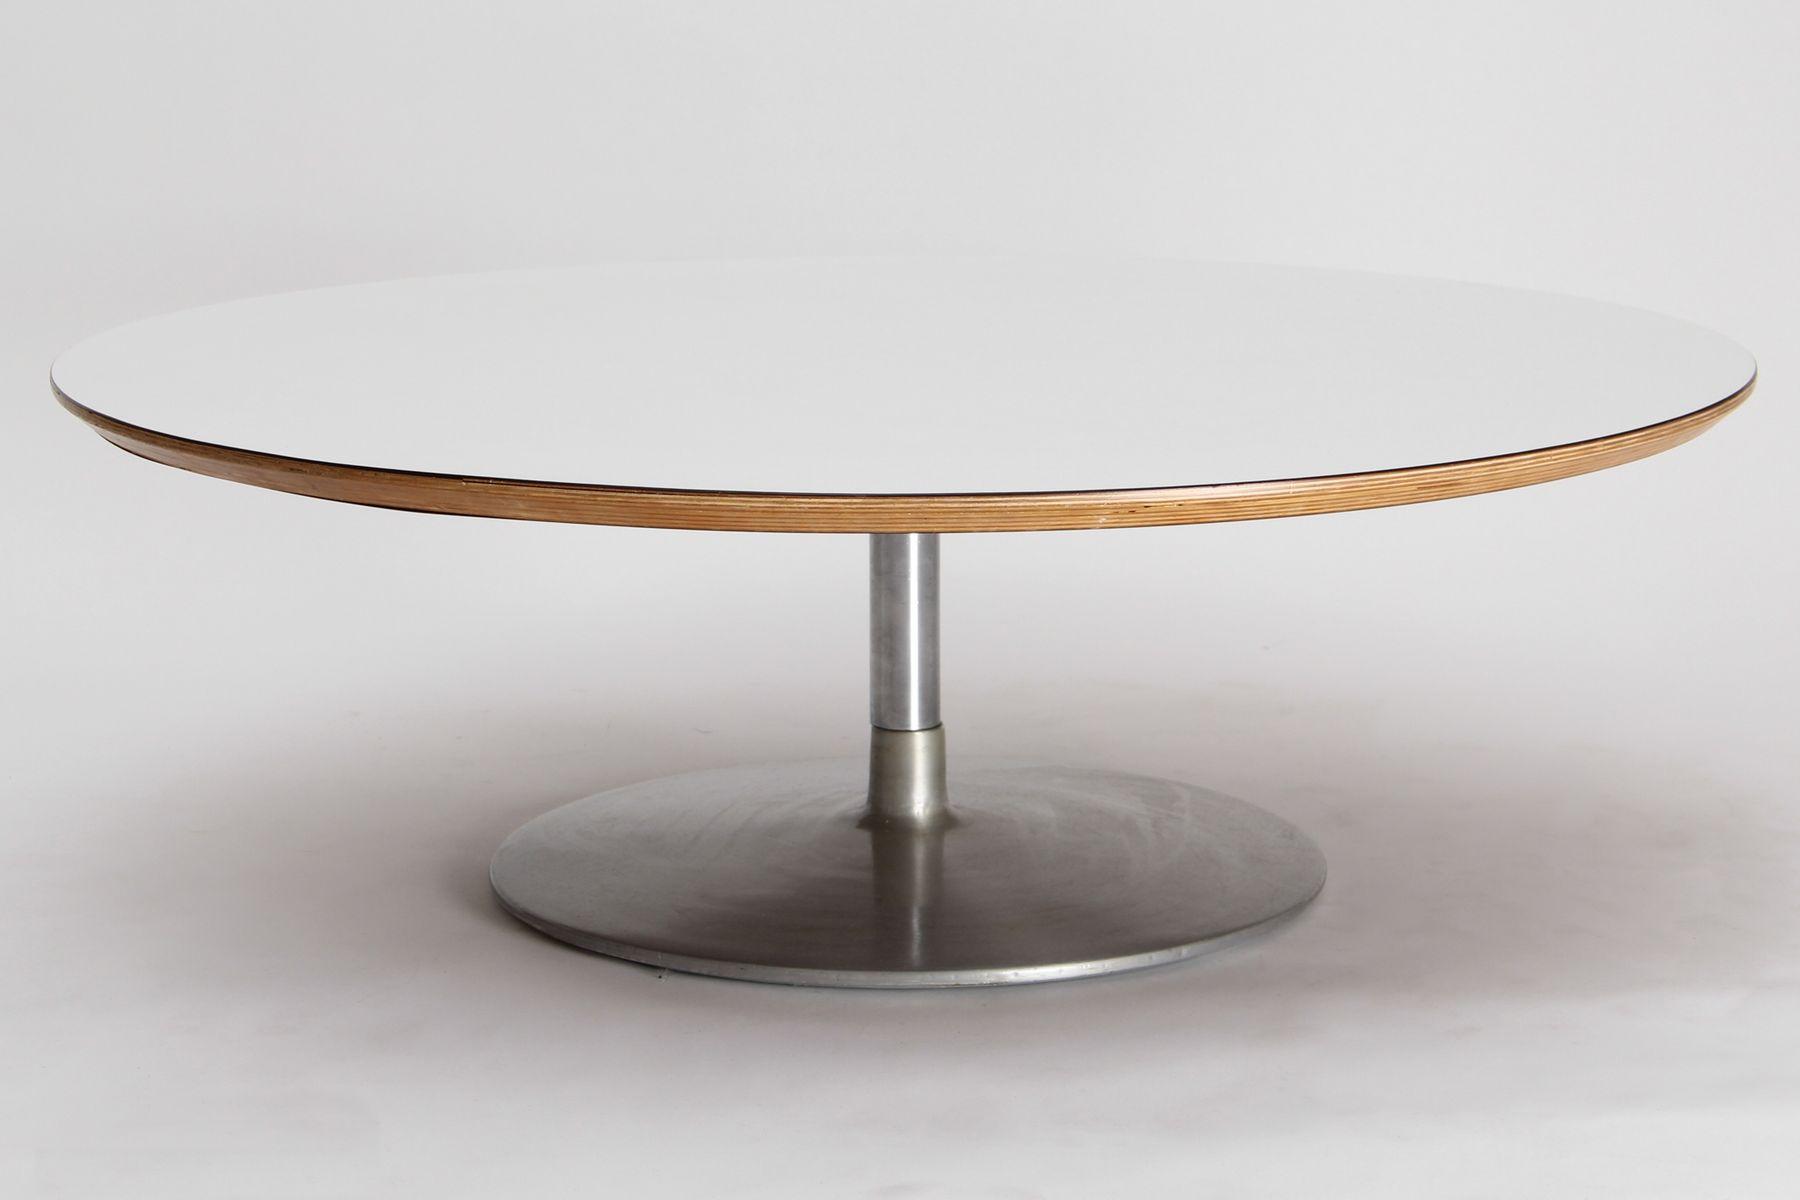 beau table basse design jersey home idea